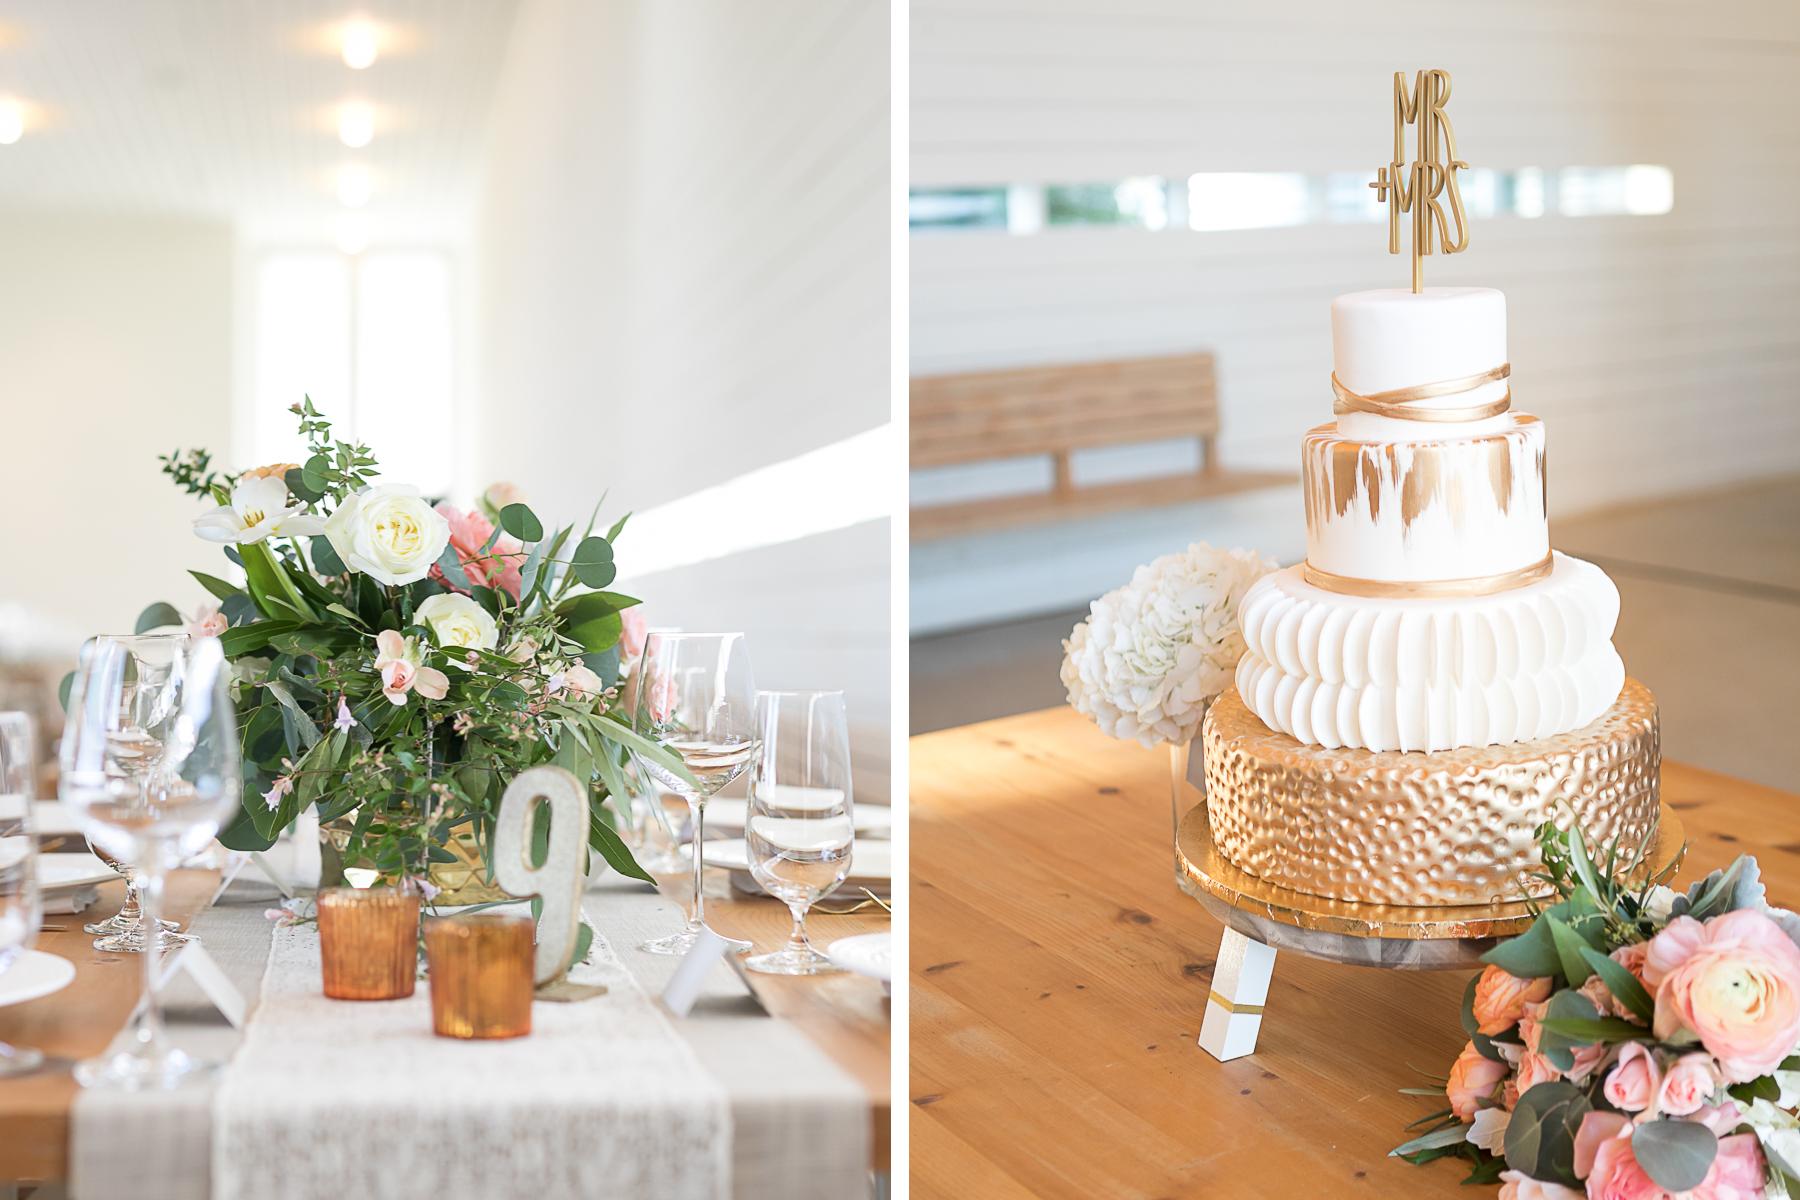 gold-wedding-cake-ideas.jpg